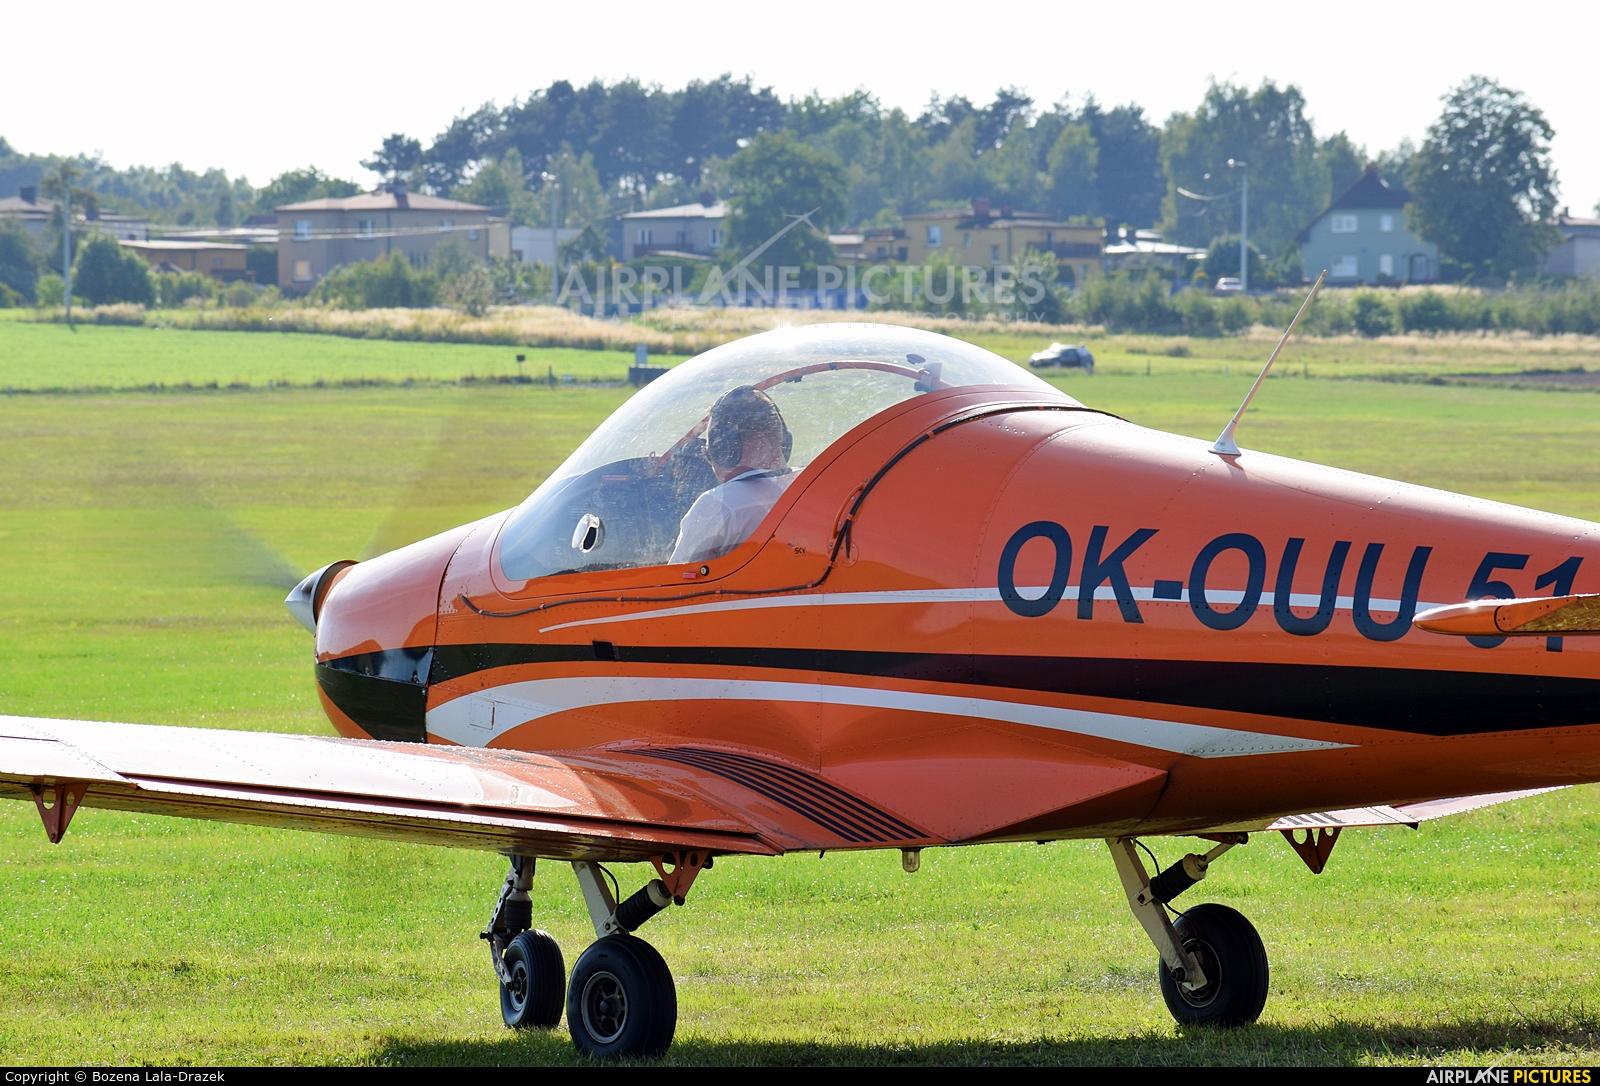 Private OK-OUU 51 aircraft at Rybnik - Gotartowice